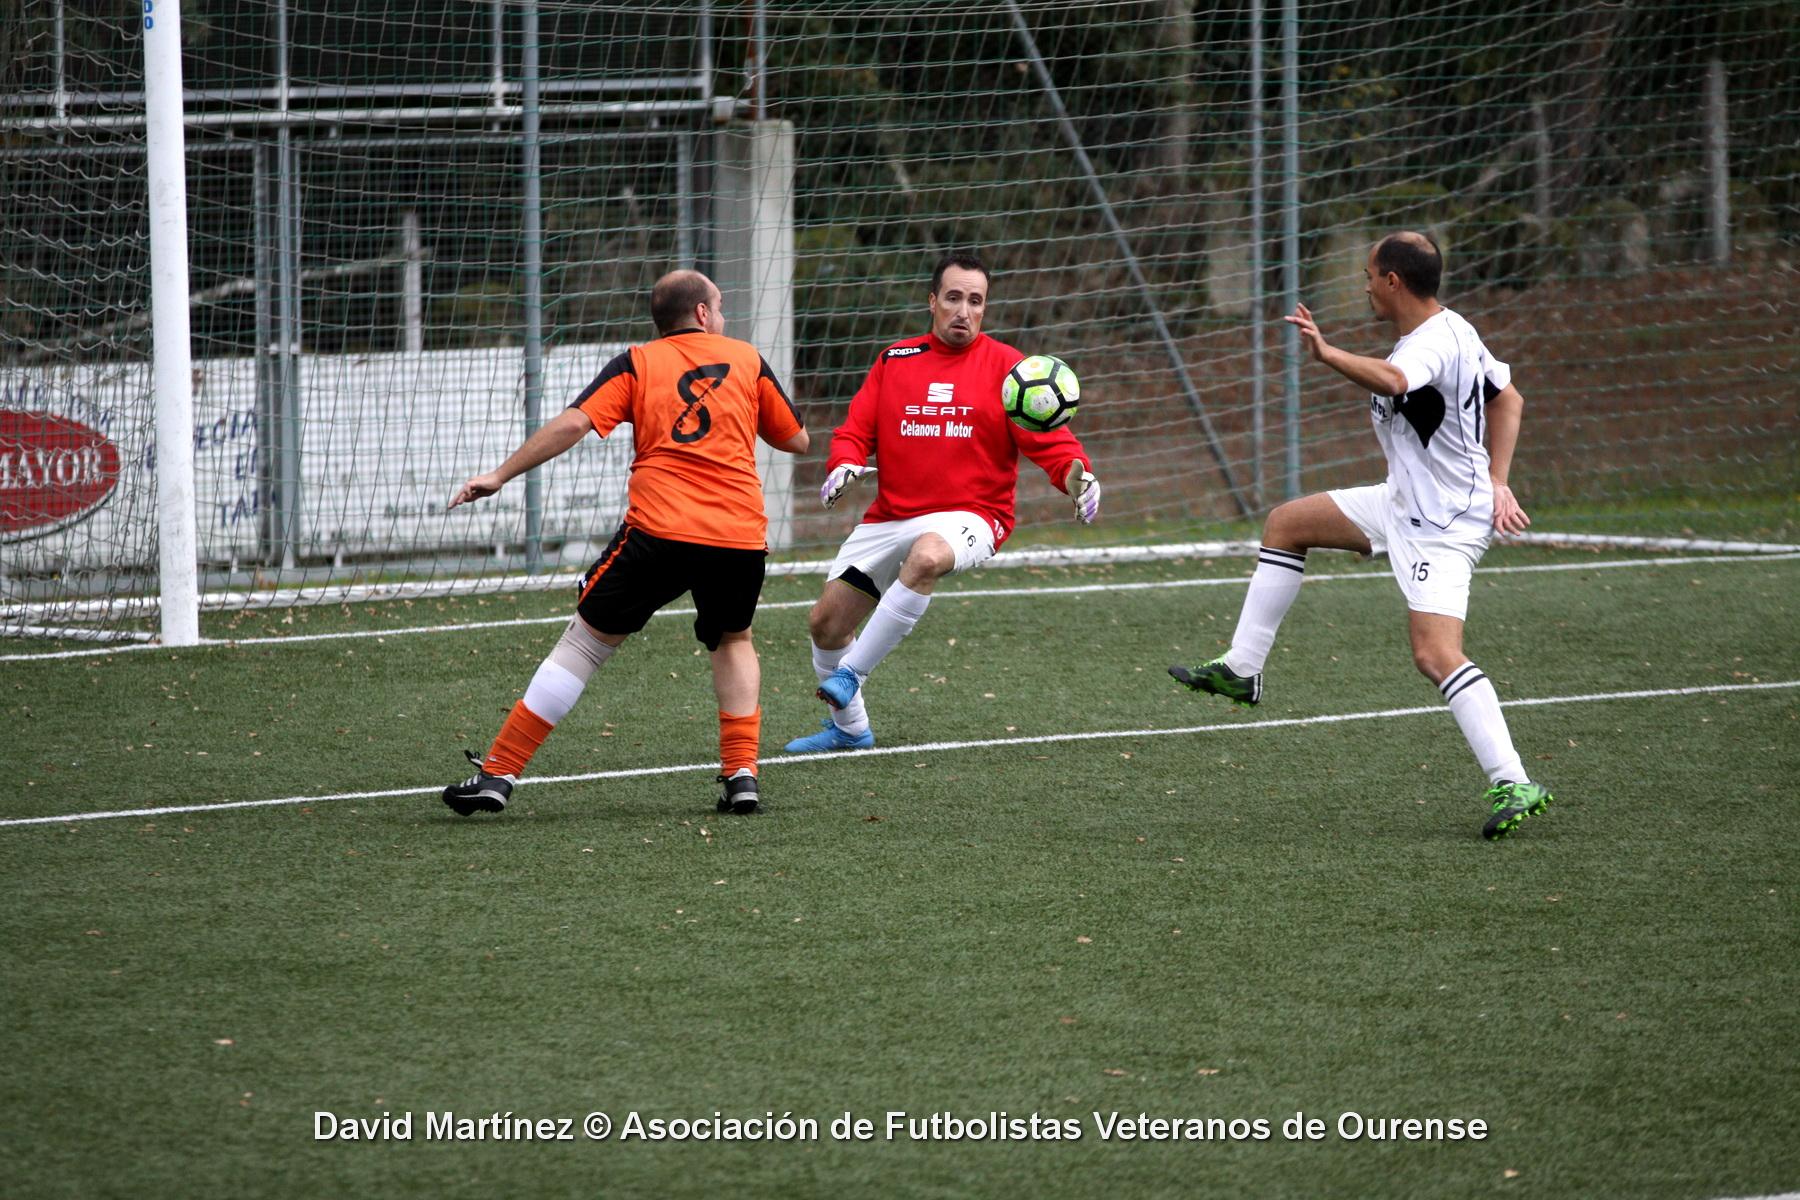 Futbol_Veteranos_Foto_DavidMartinez_01